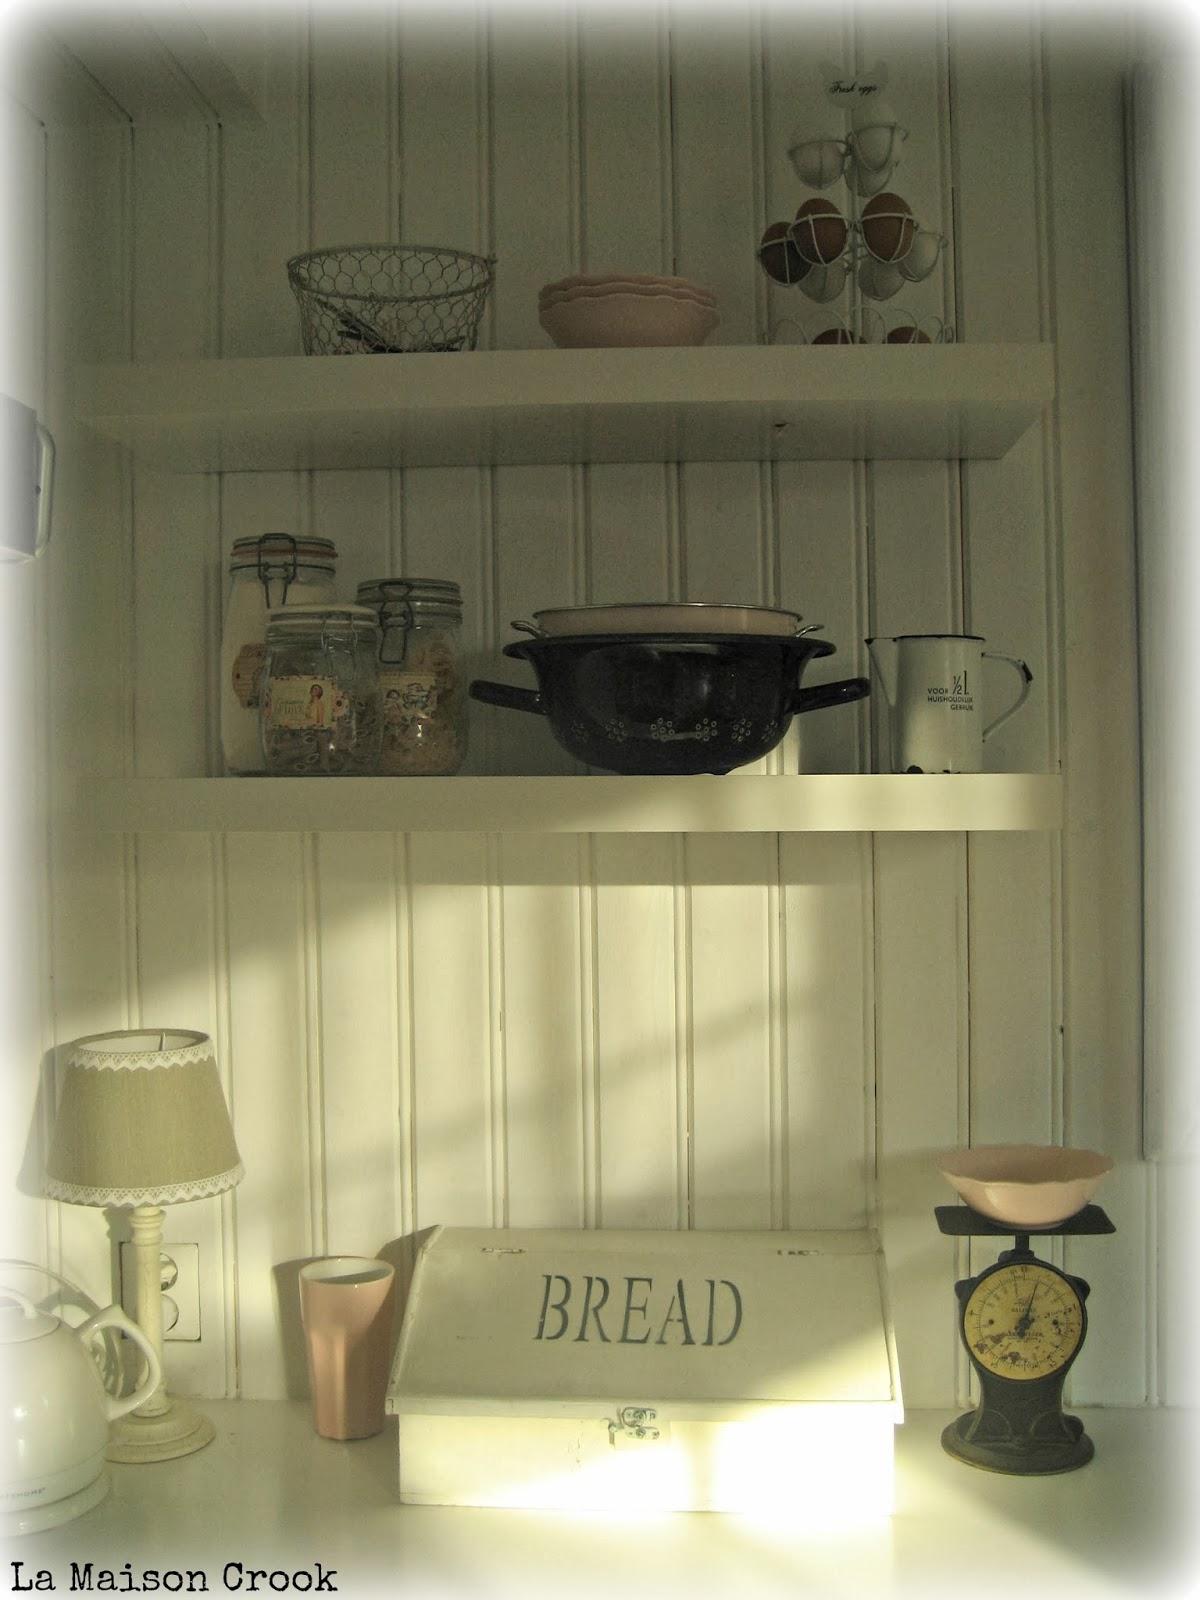 La maison crook: keuken metamorfose